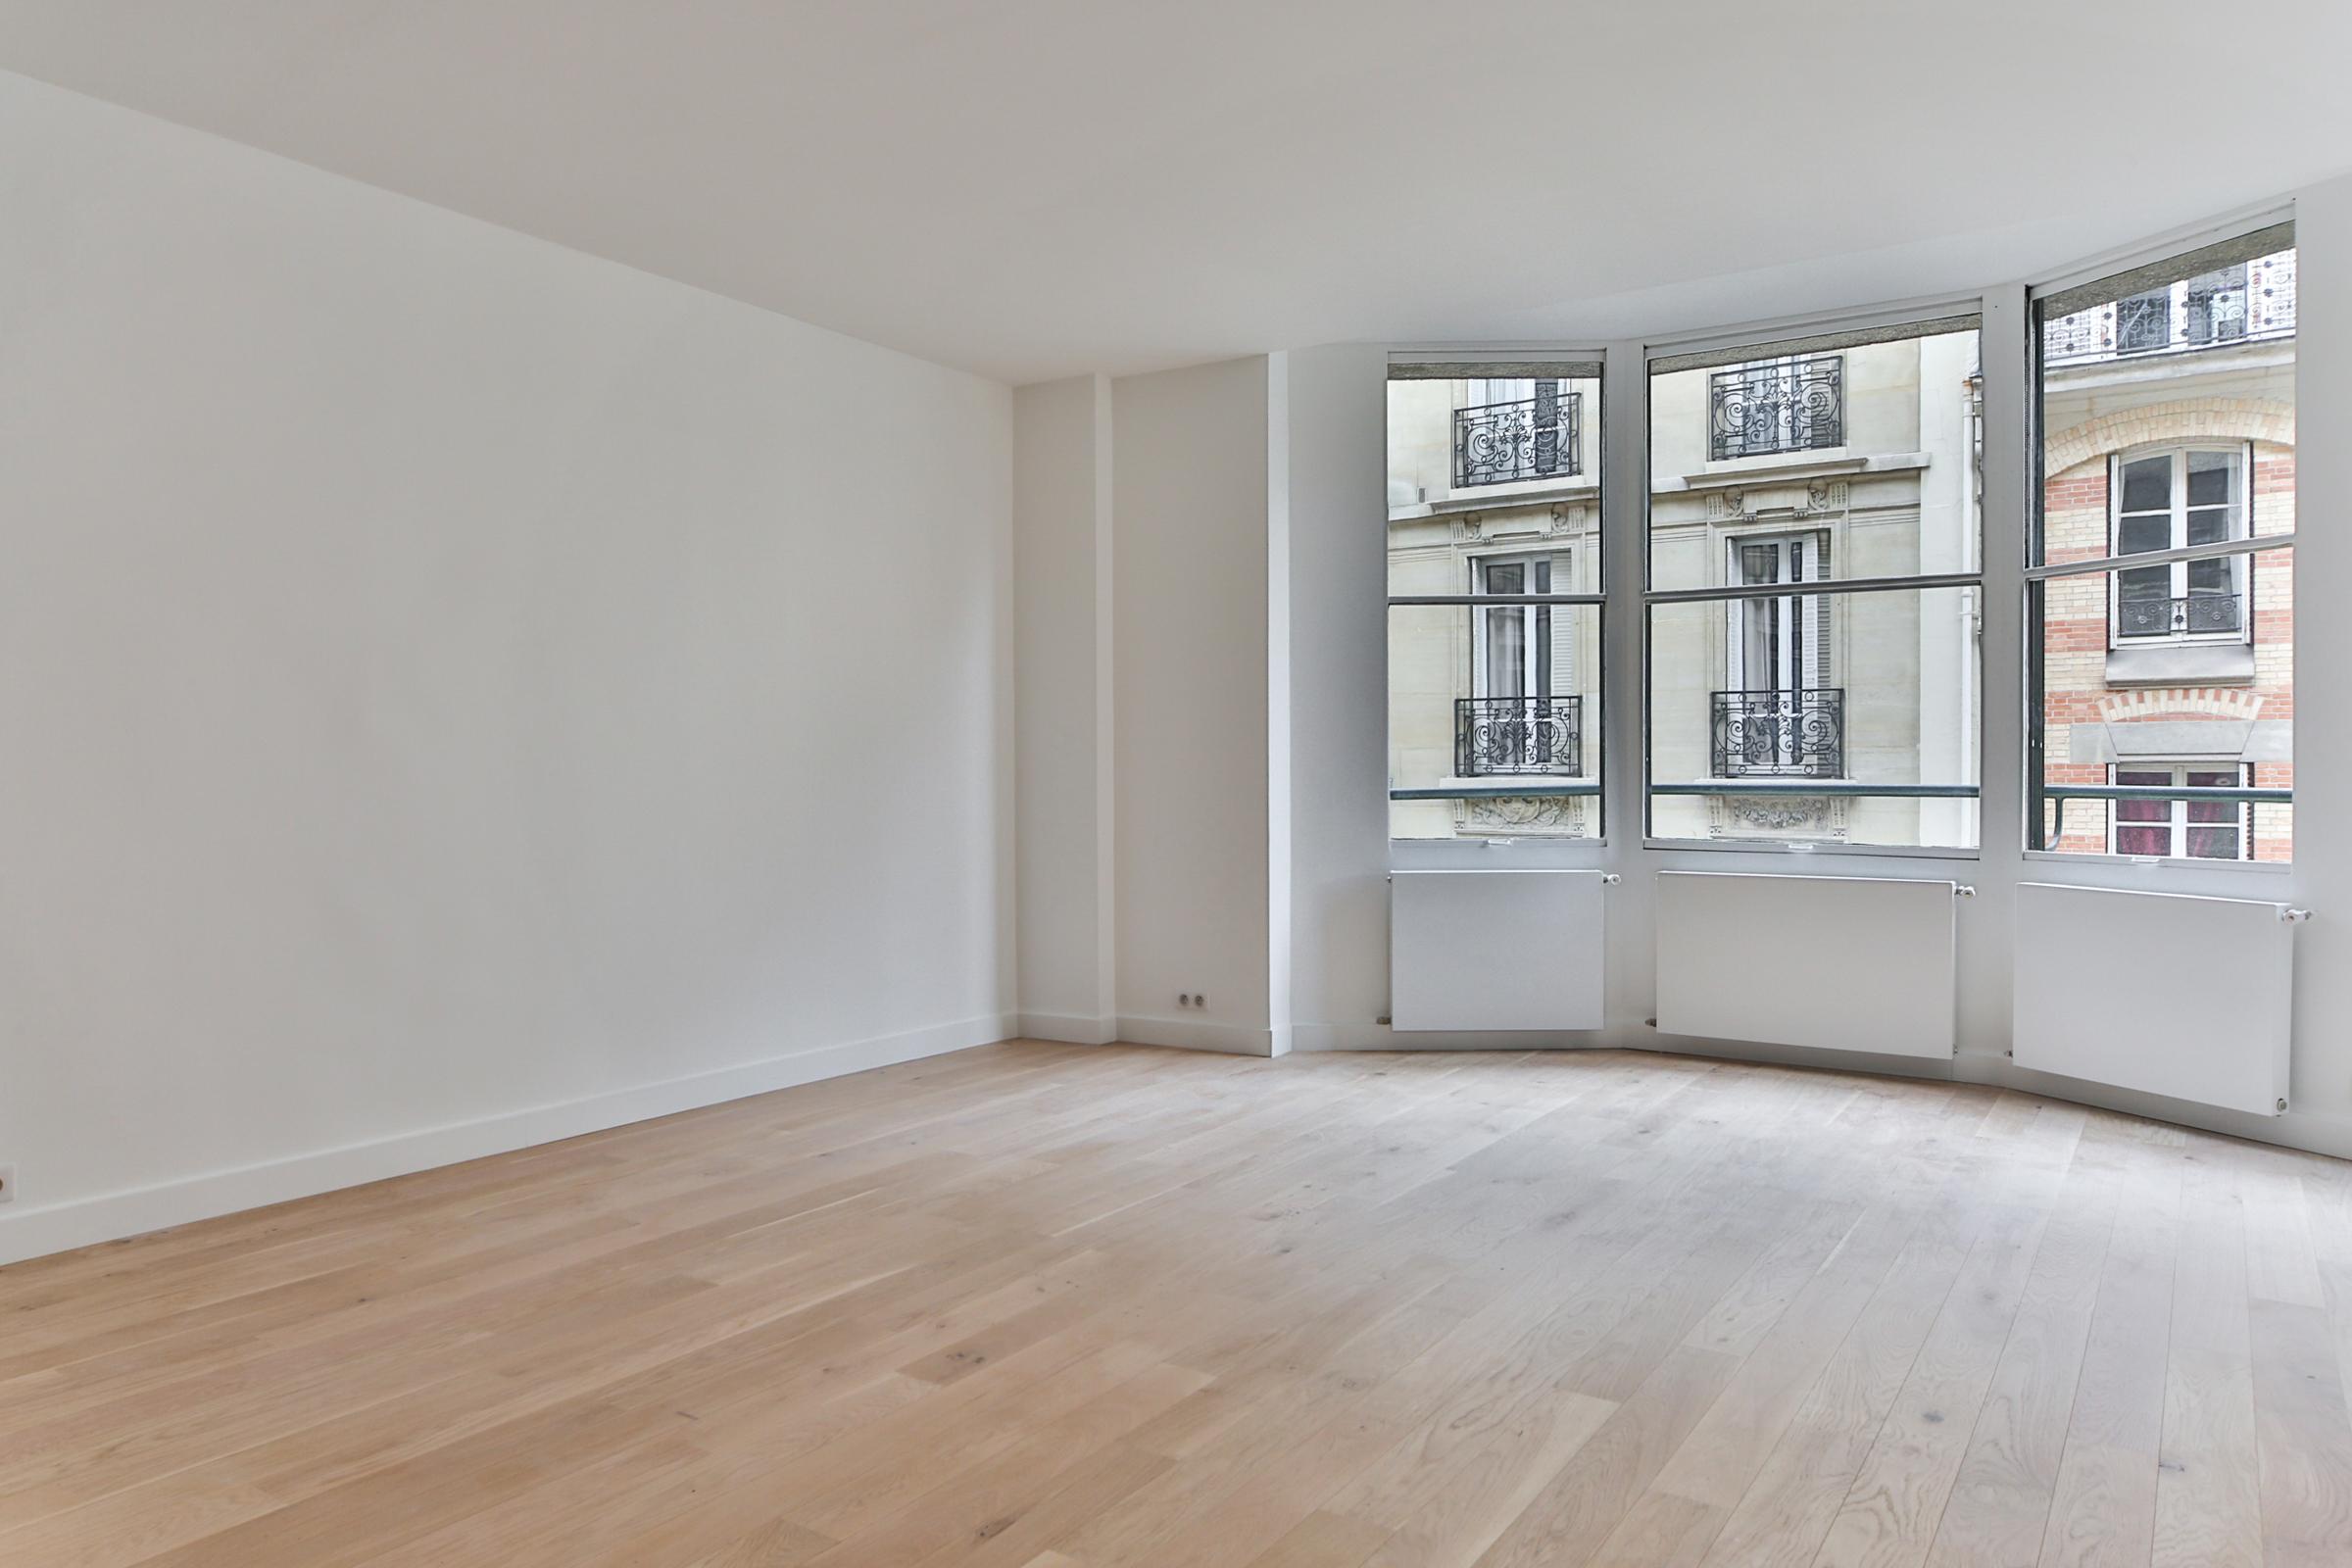 Квартира для того Продажа на Apartment - Pompe La Tour Paris, Париж 75016 Франция